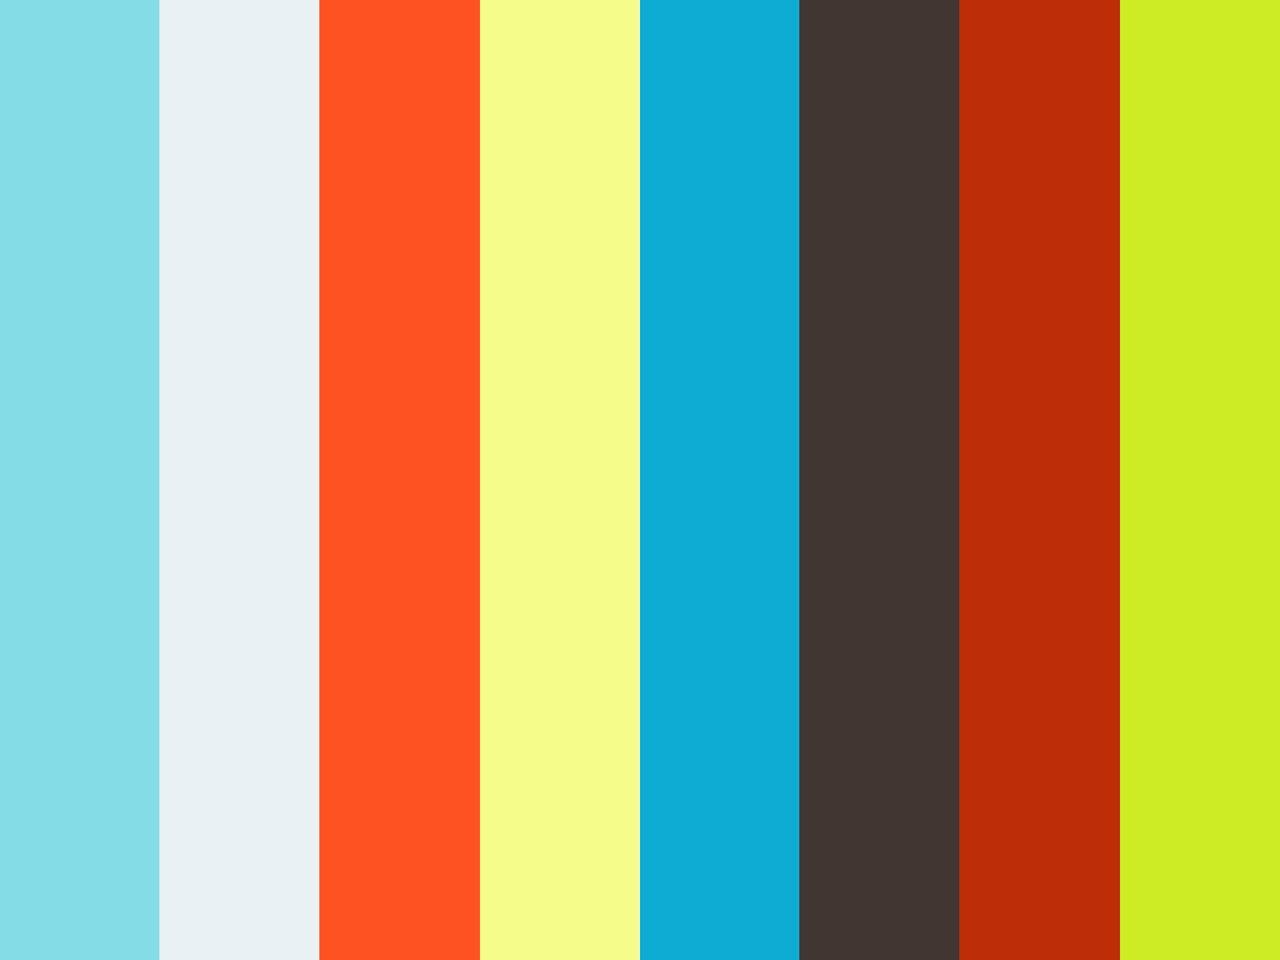 Cepheid GeneXpert - Whiteboard Animation